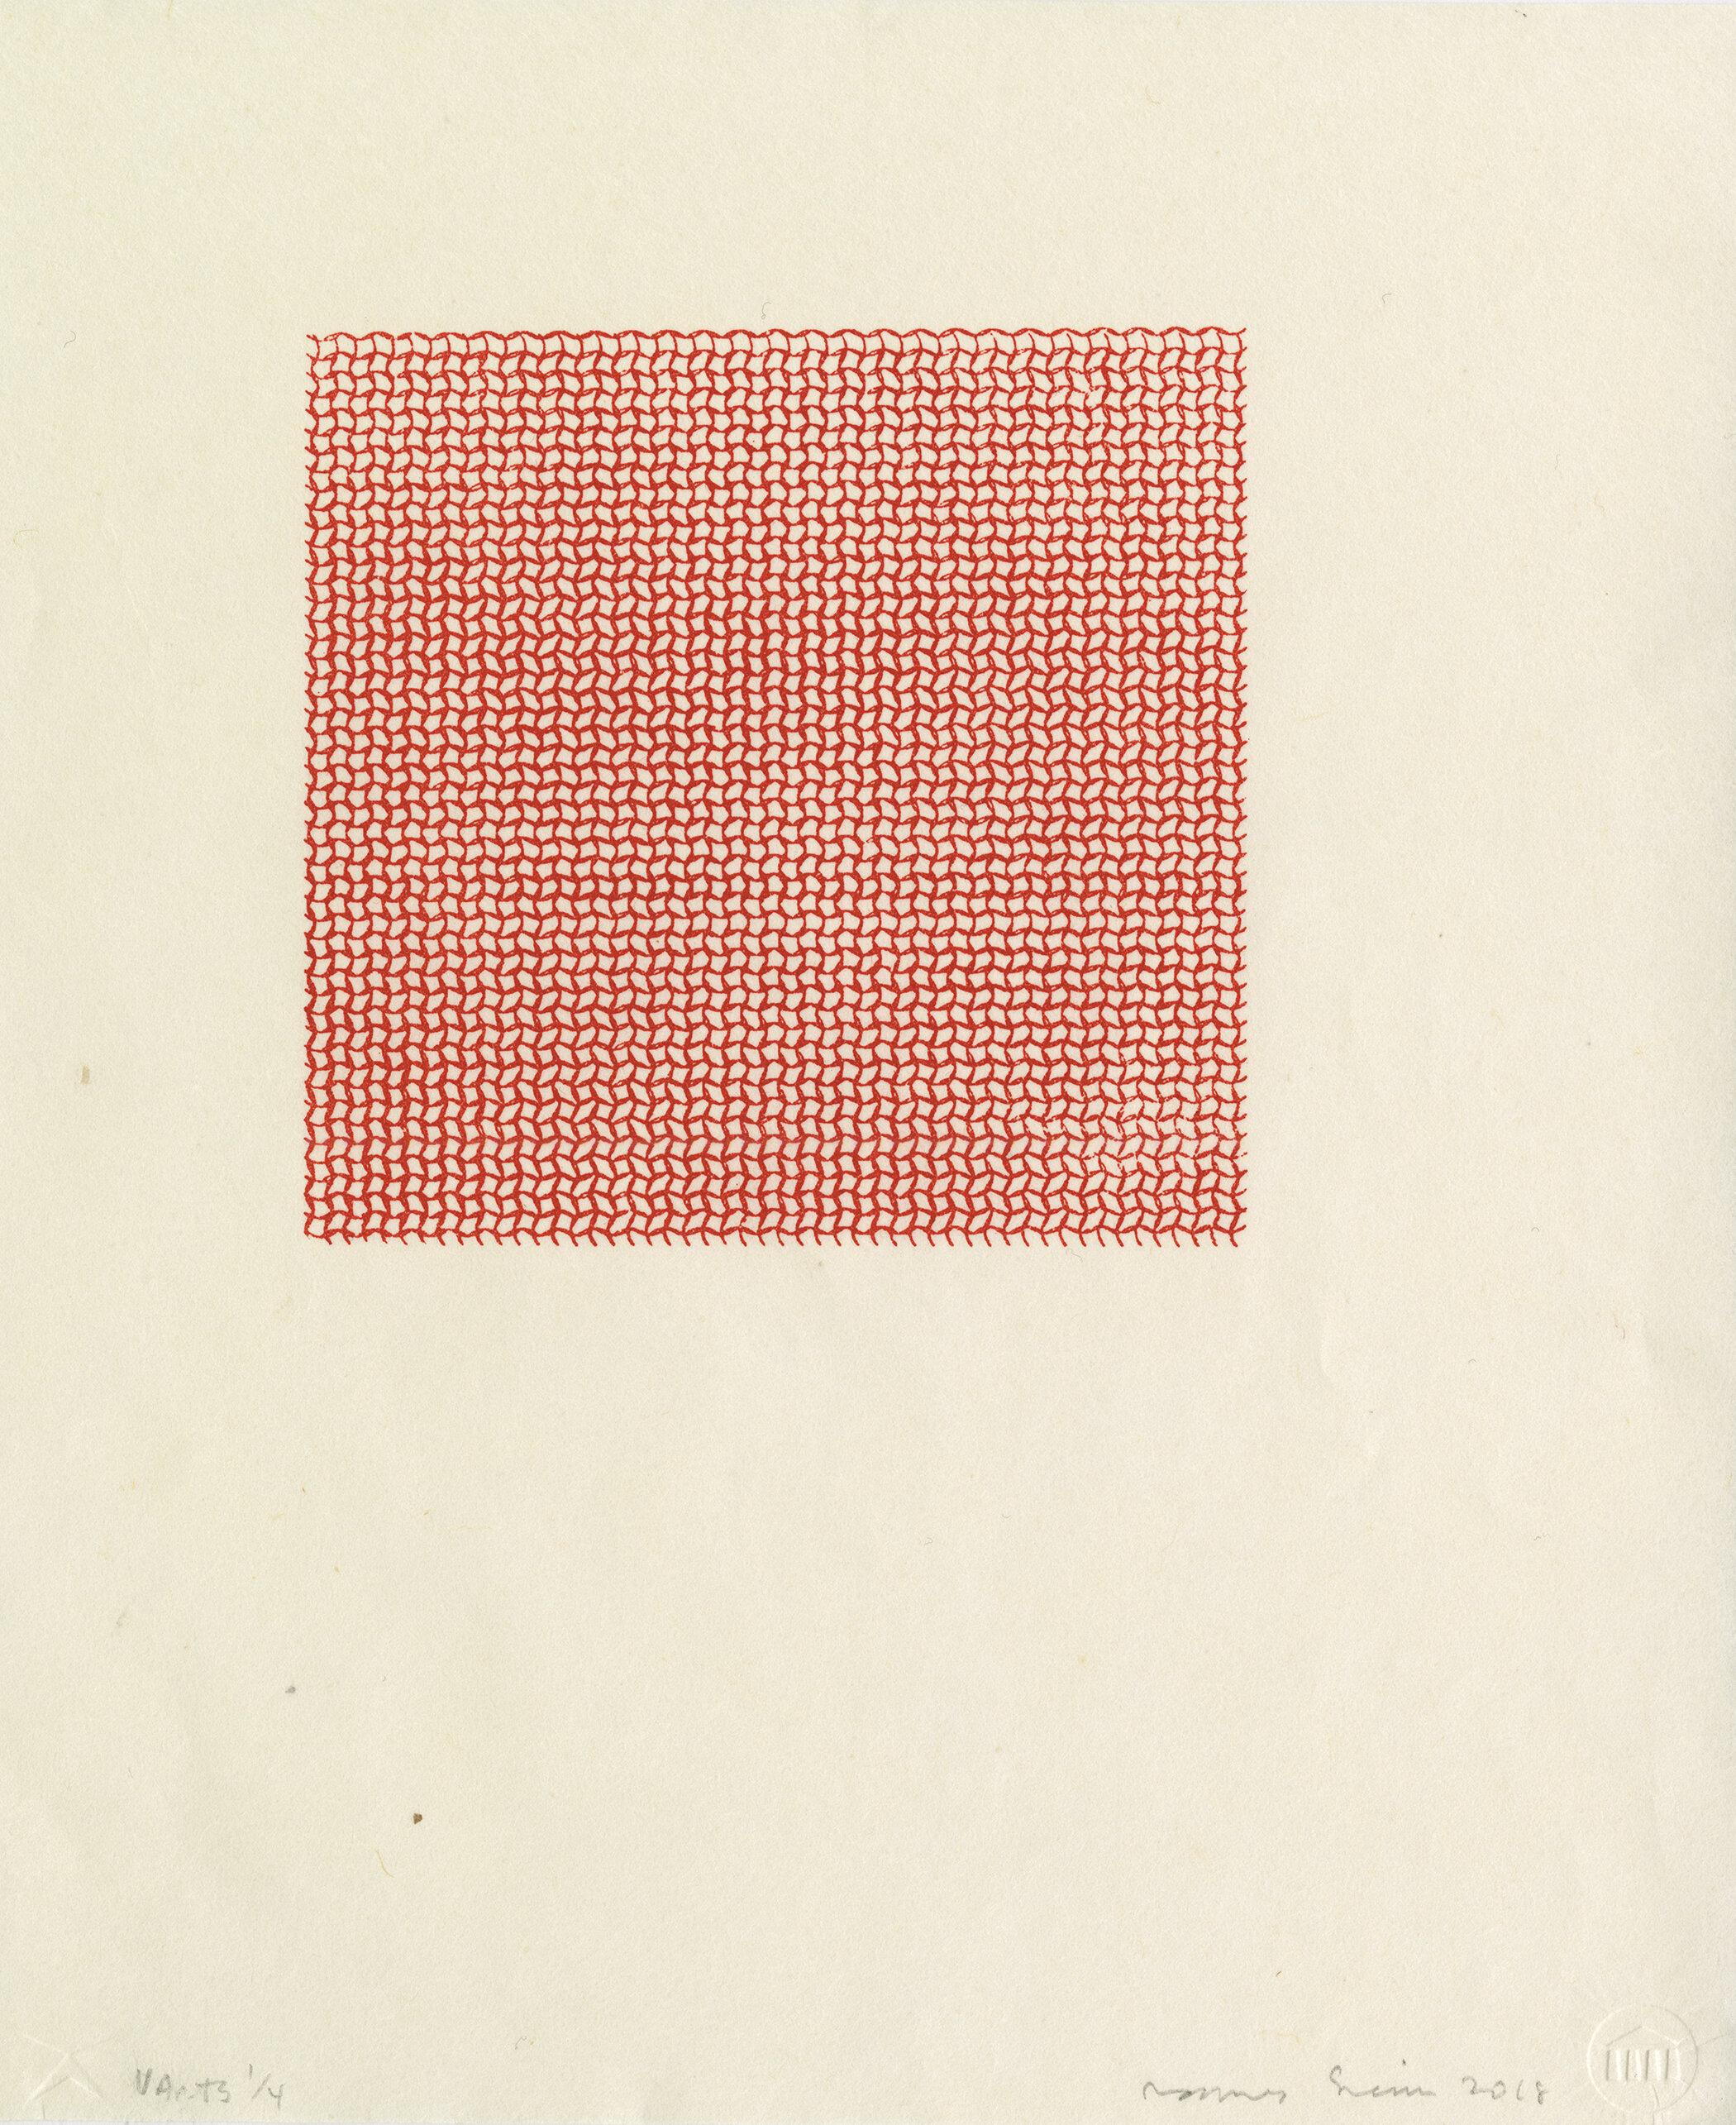 Siena_Parentheses_Tesselating-CARD.jpg